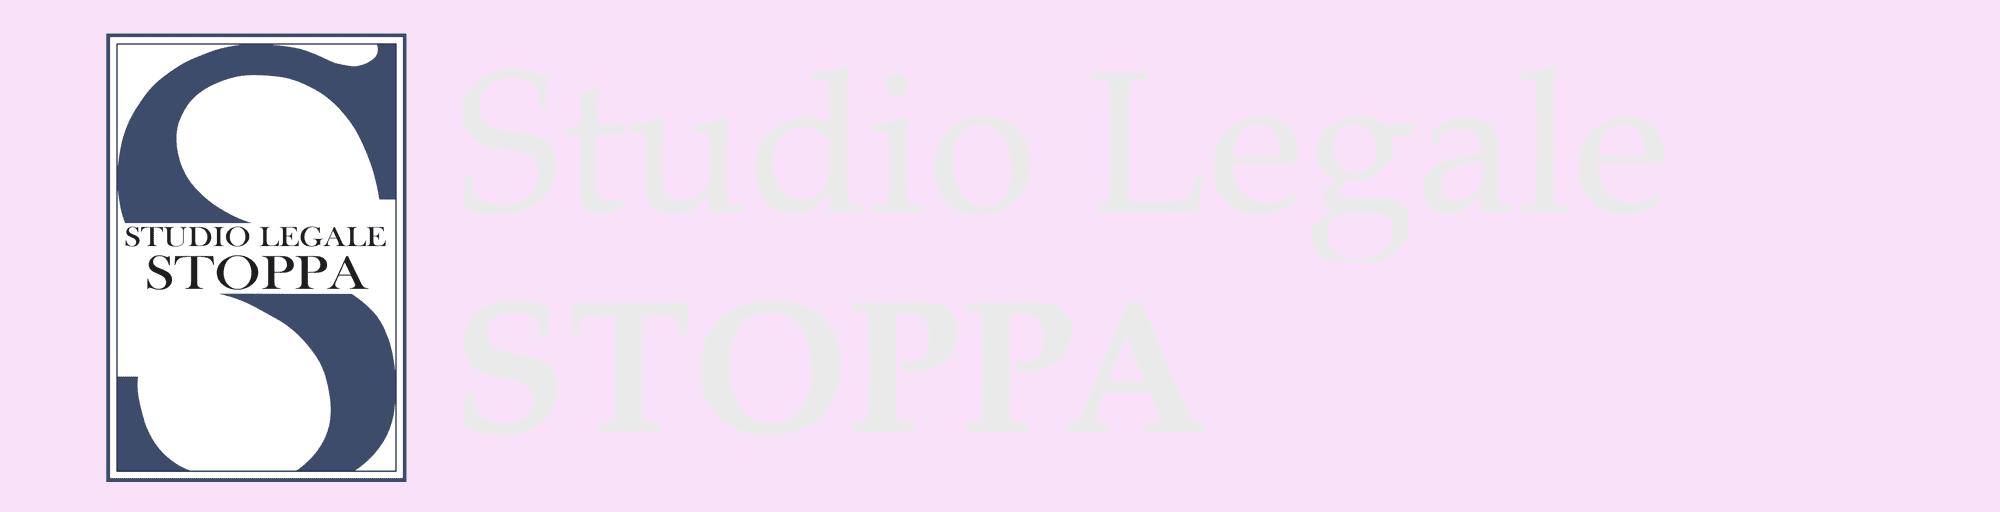 Studio Legale Stoppa